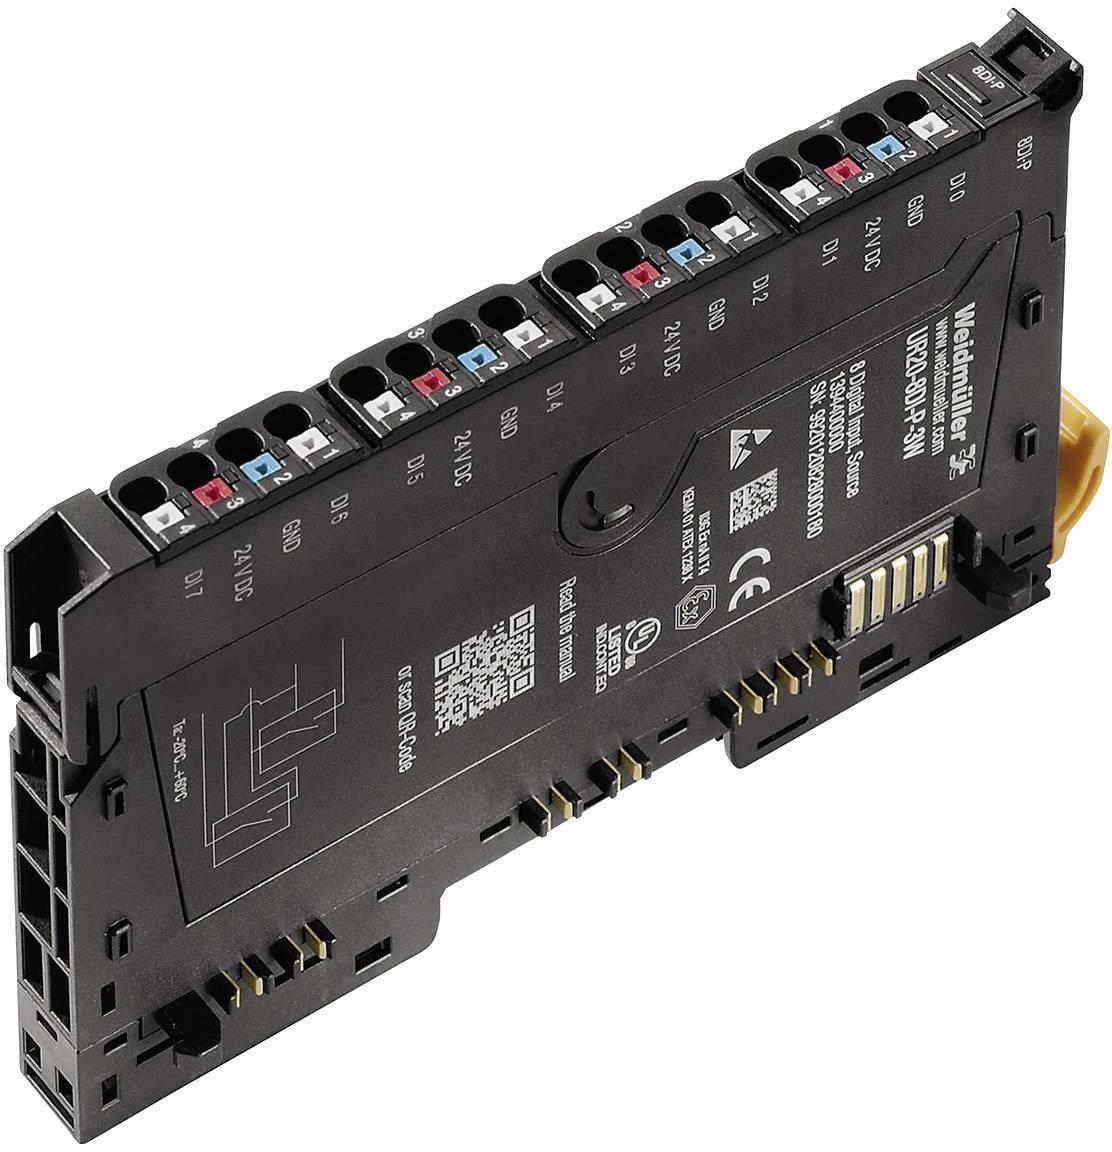 Vstupní modul pro PLC Weidmüller UR20-8DI-P-2W, 1315180000